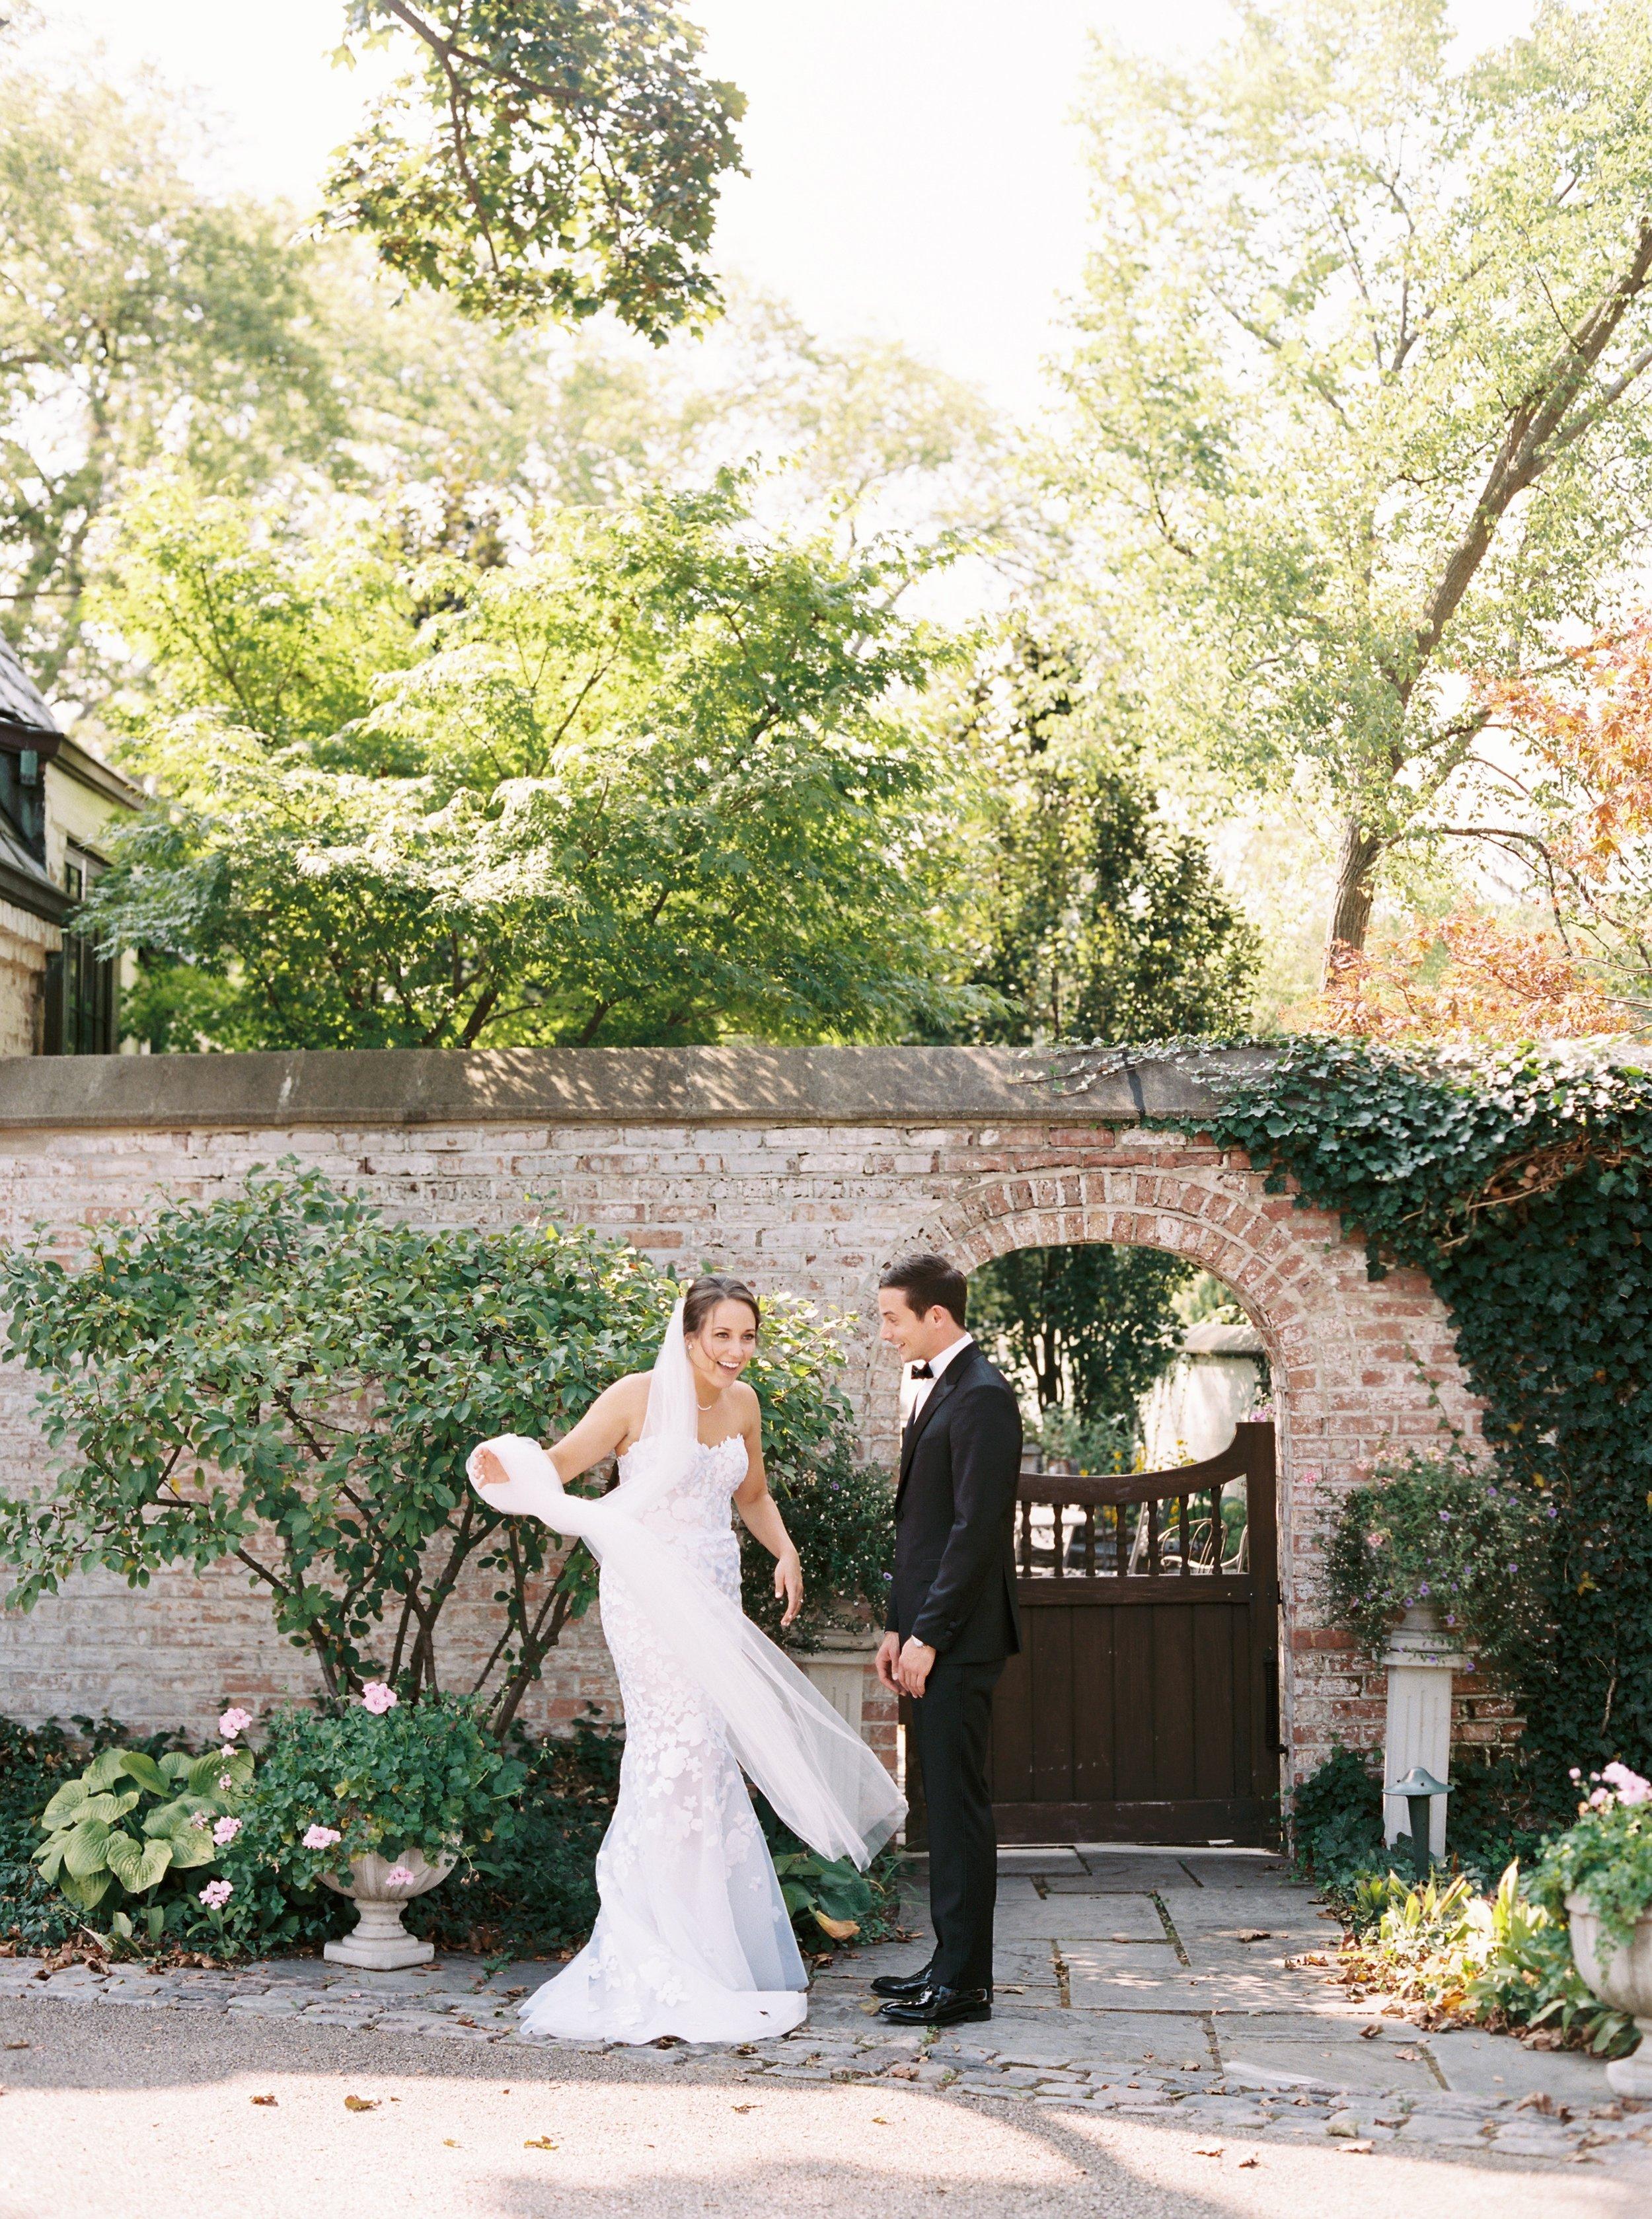 Kyle John l Fine Art Wedding Photography l Chicago, Copenhagen, California, New York, Destination l Blog l Kate and Michael_Winnetka_9